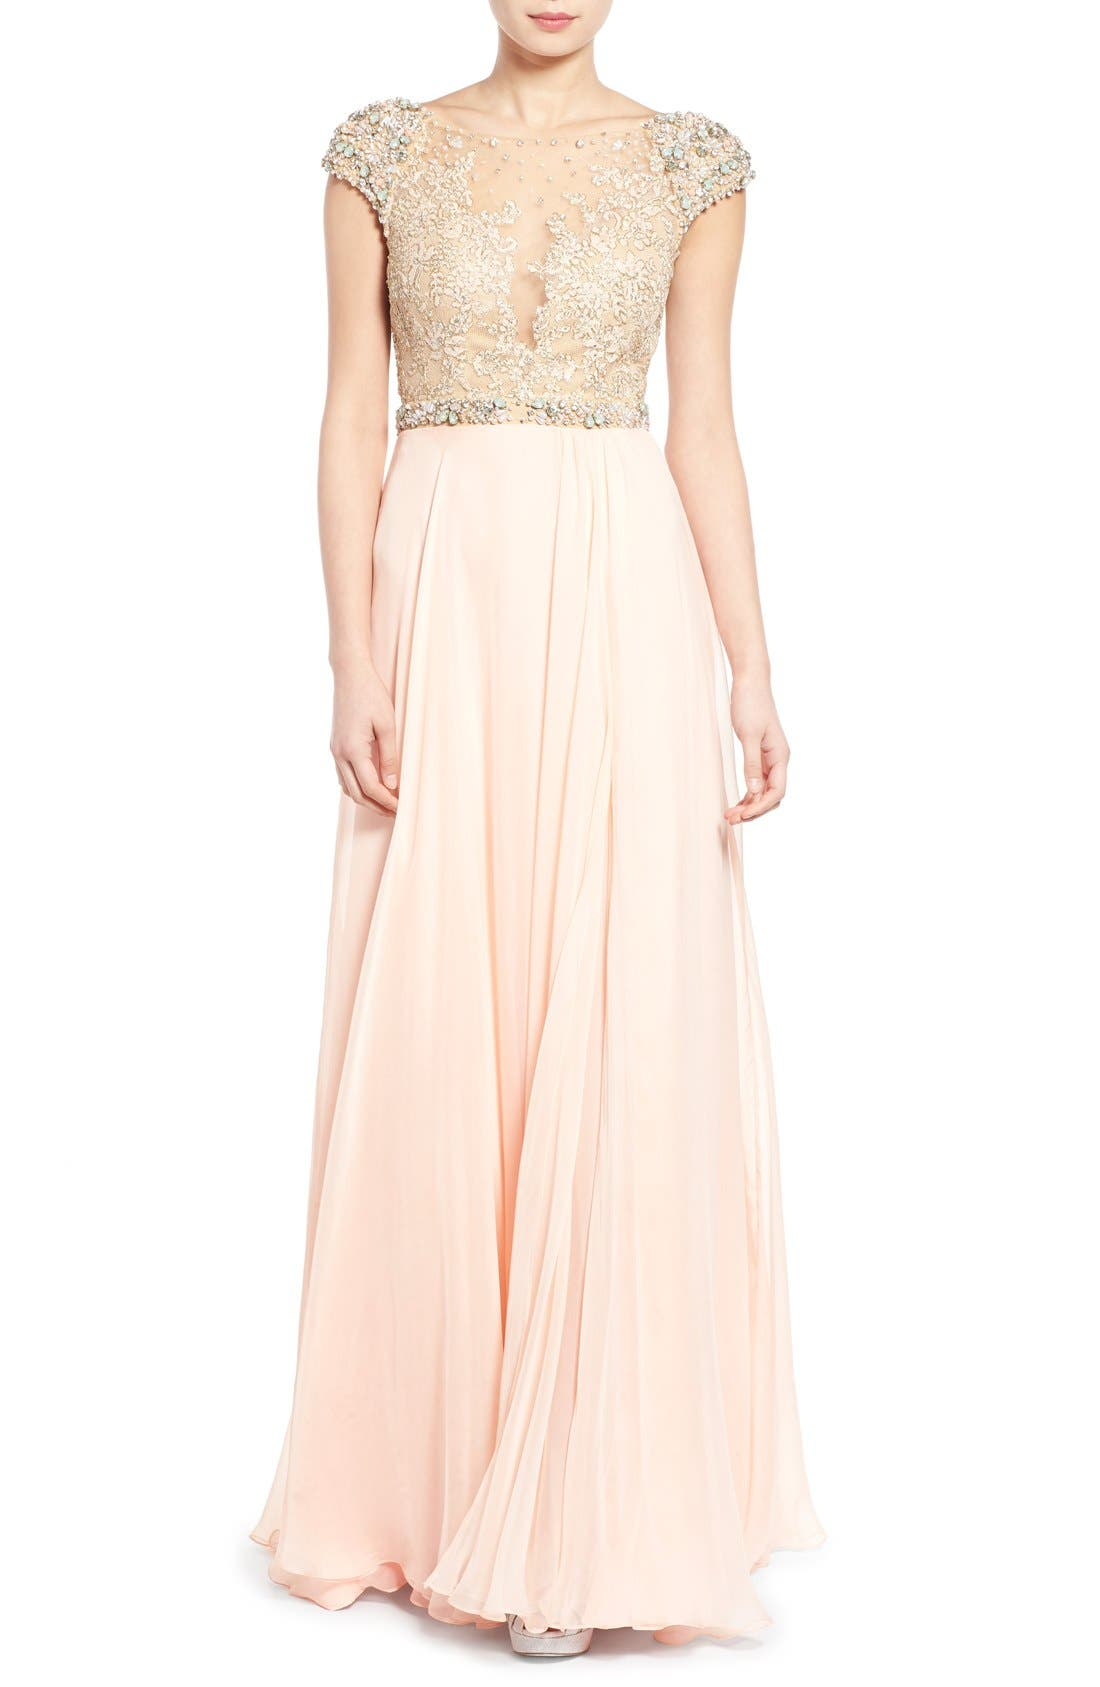 Main Image - Mac Duggal 'Gladys' Embellished Gown